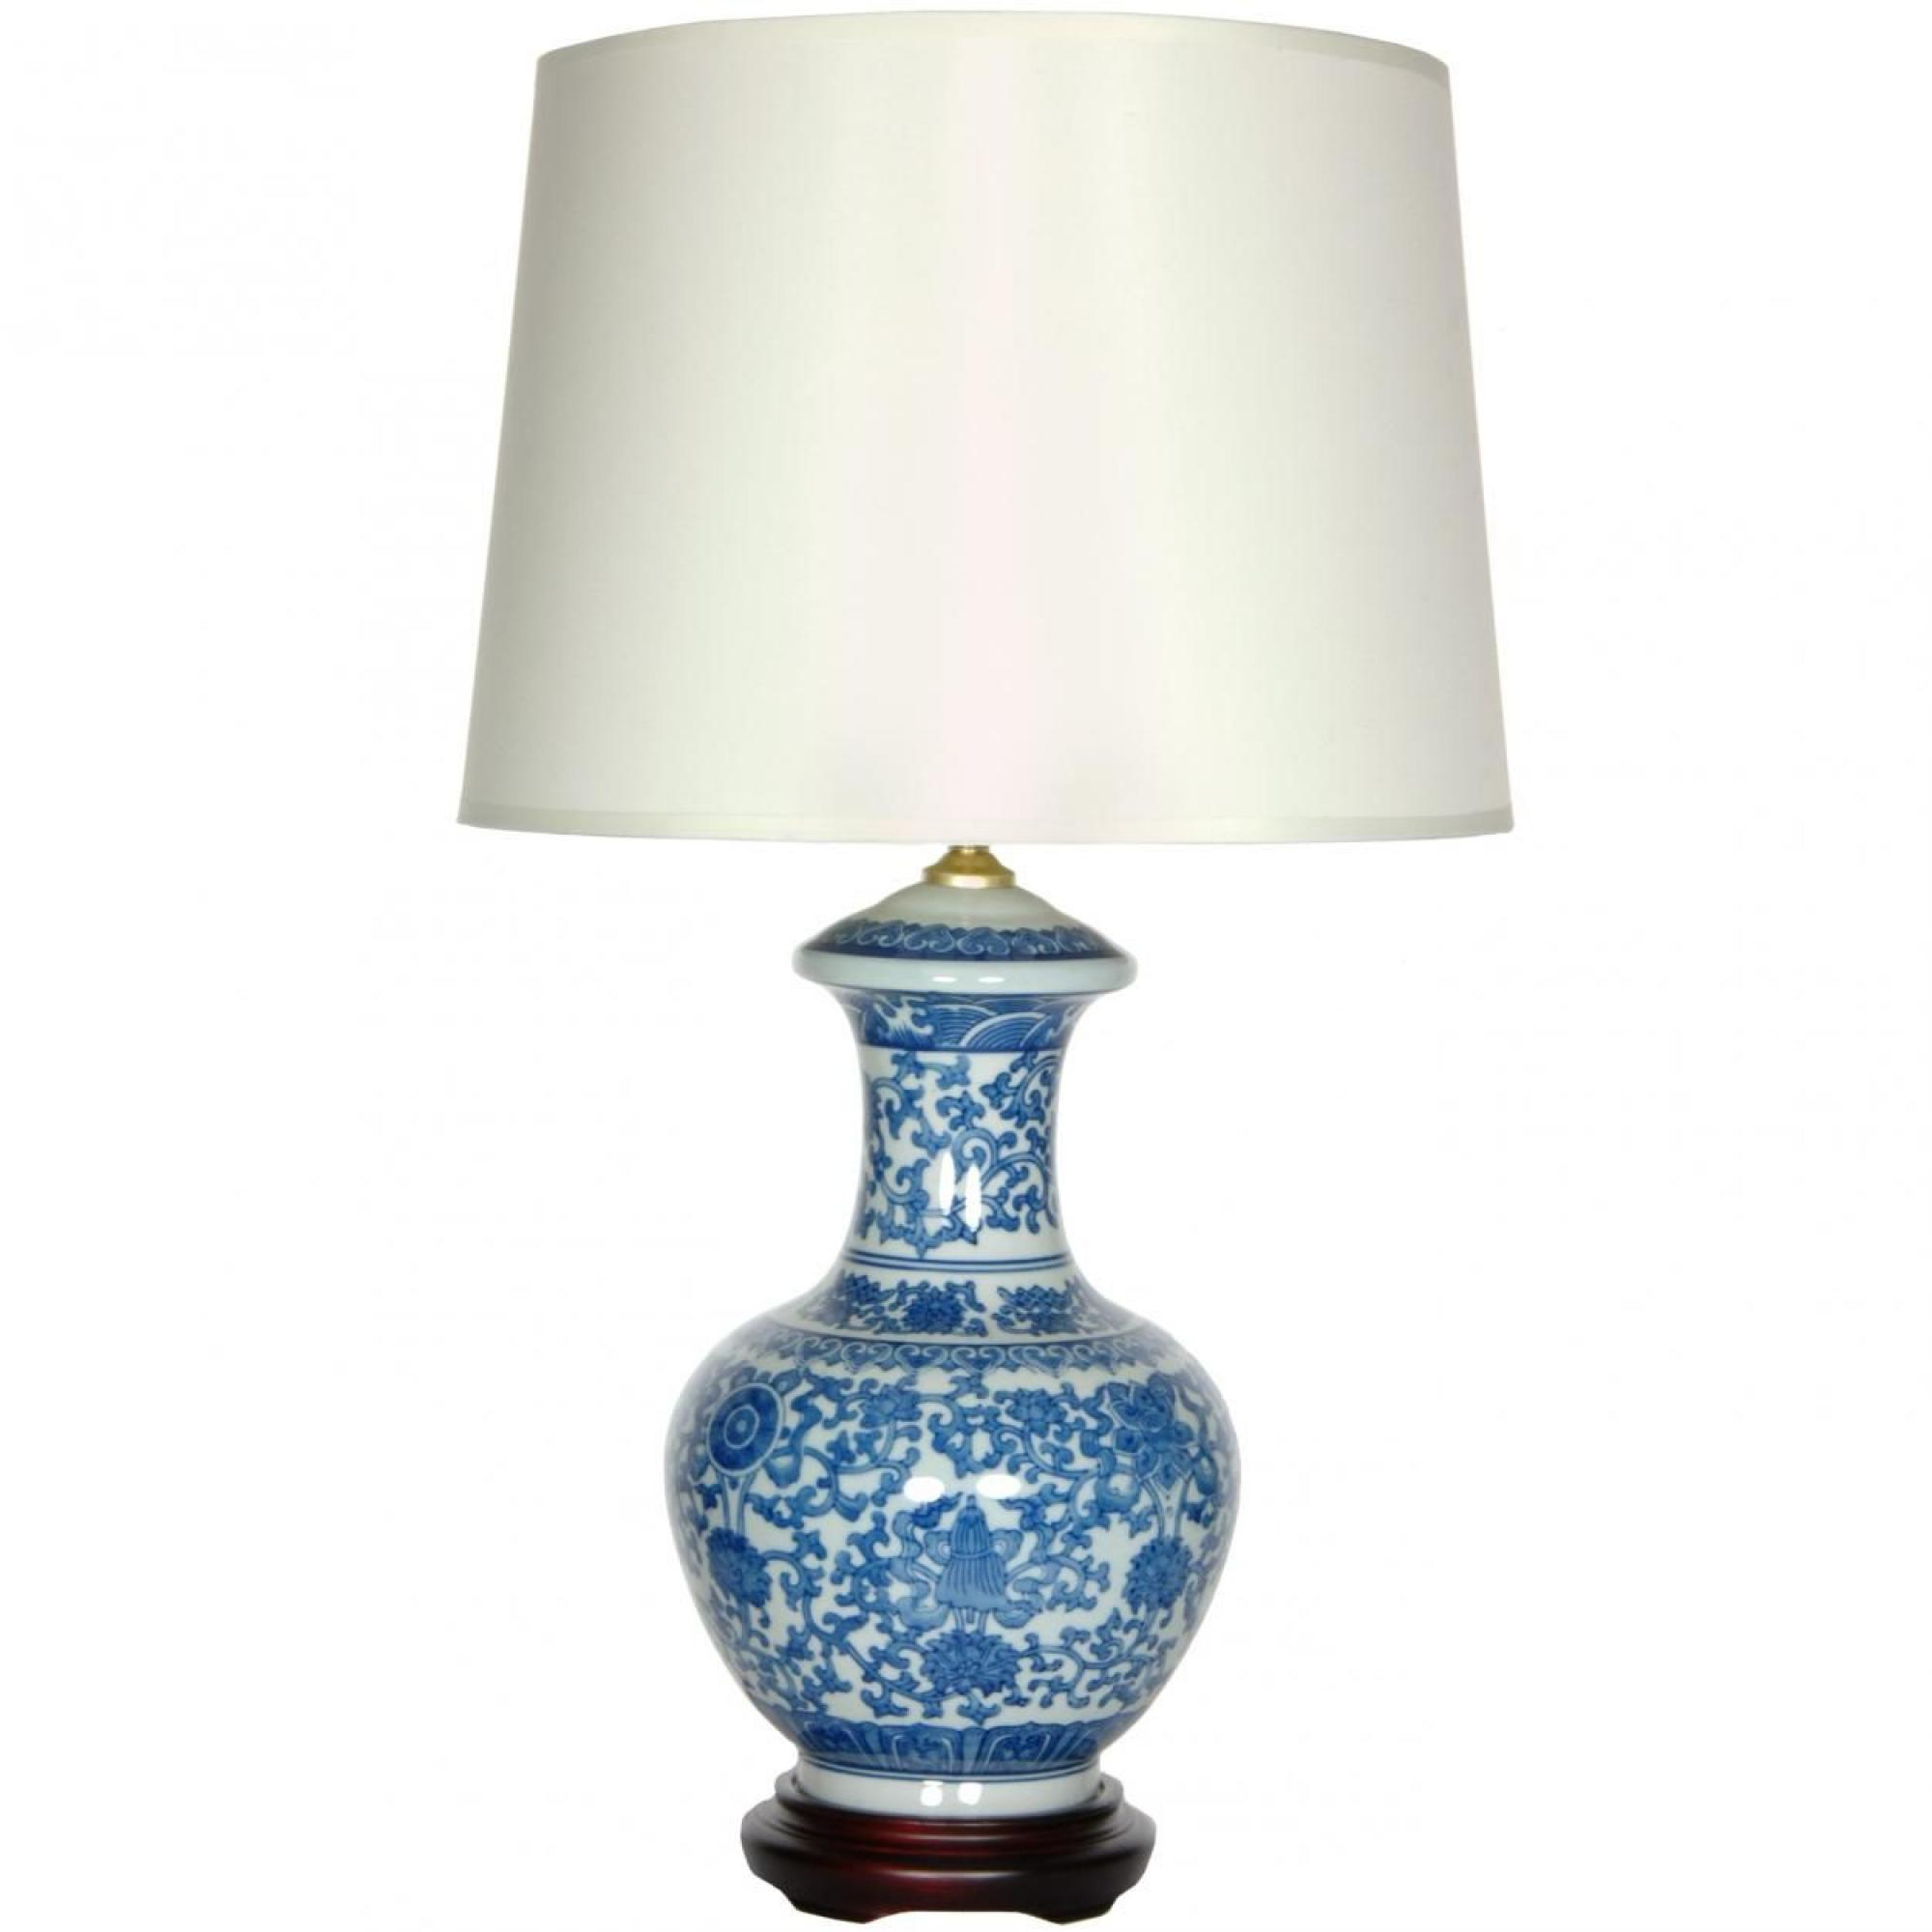 24 5 Blue White Porcelain Round Vase Lamp Oriental Table Lamps